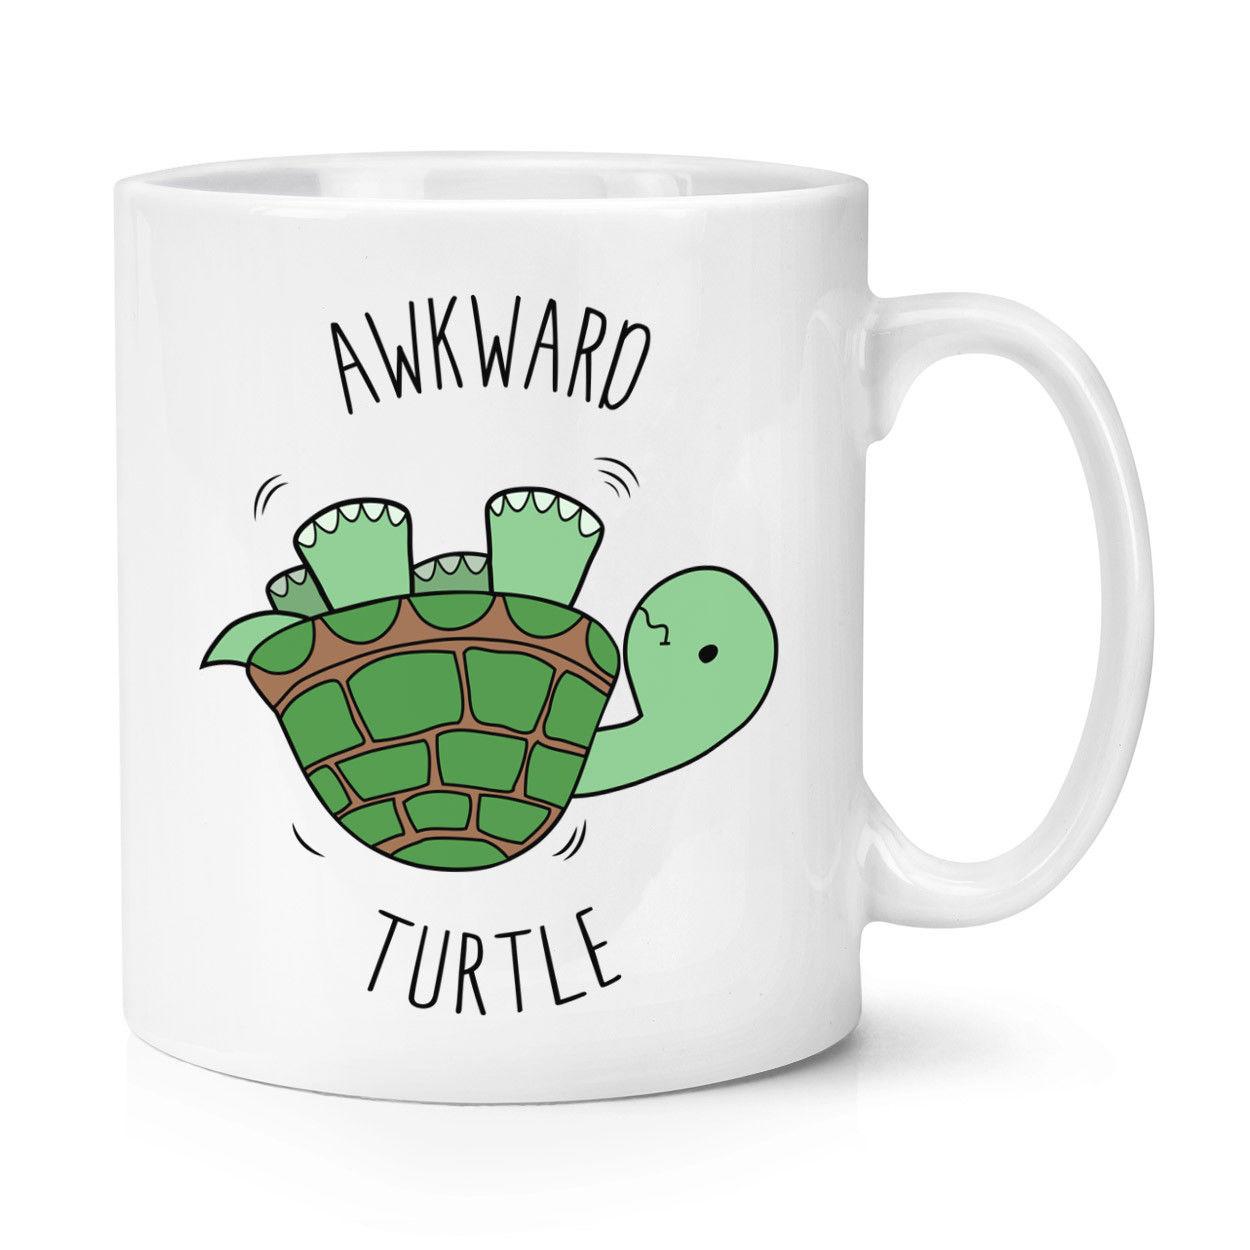 World/'s Best Vegetarian 10oz Mug Cup Funny Joke Favourite